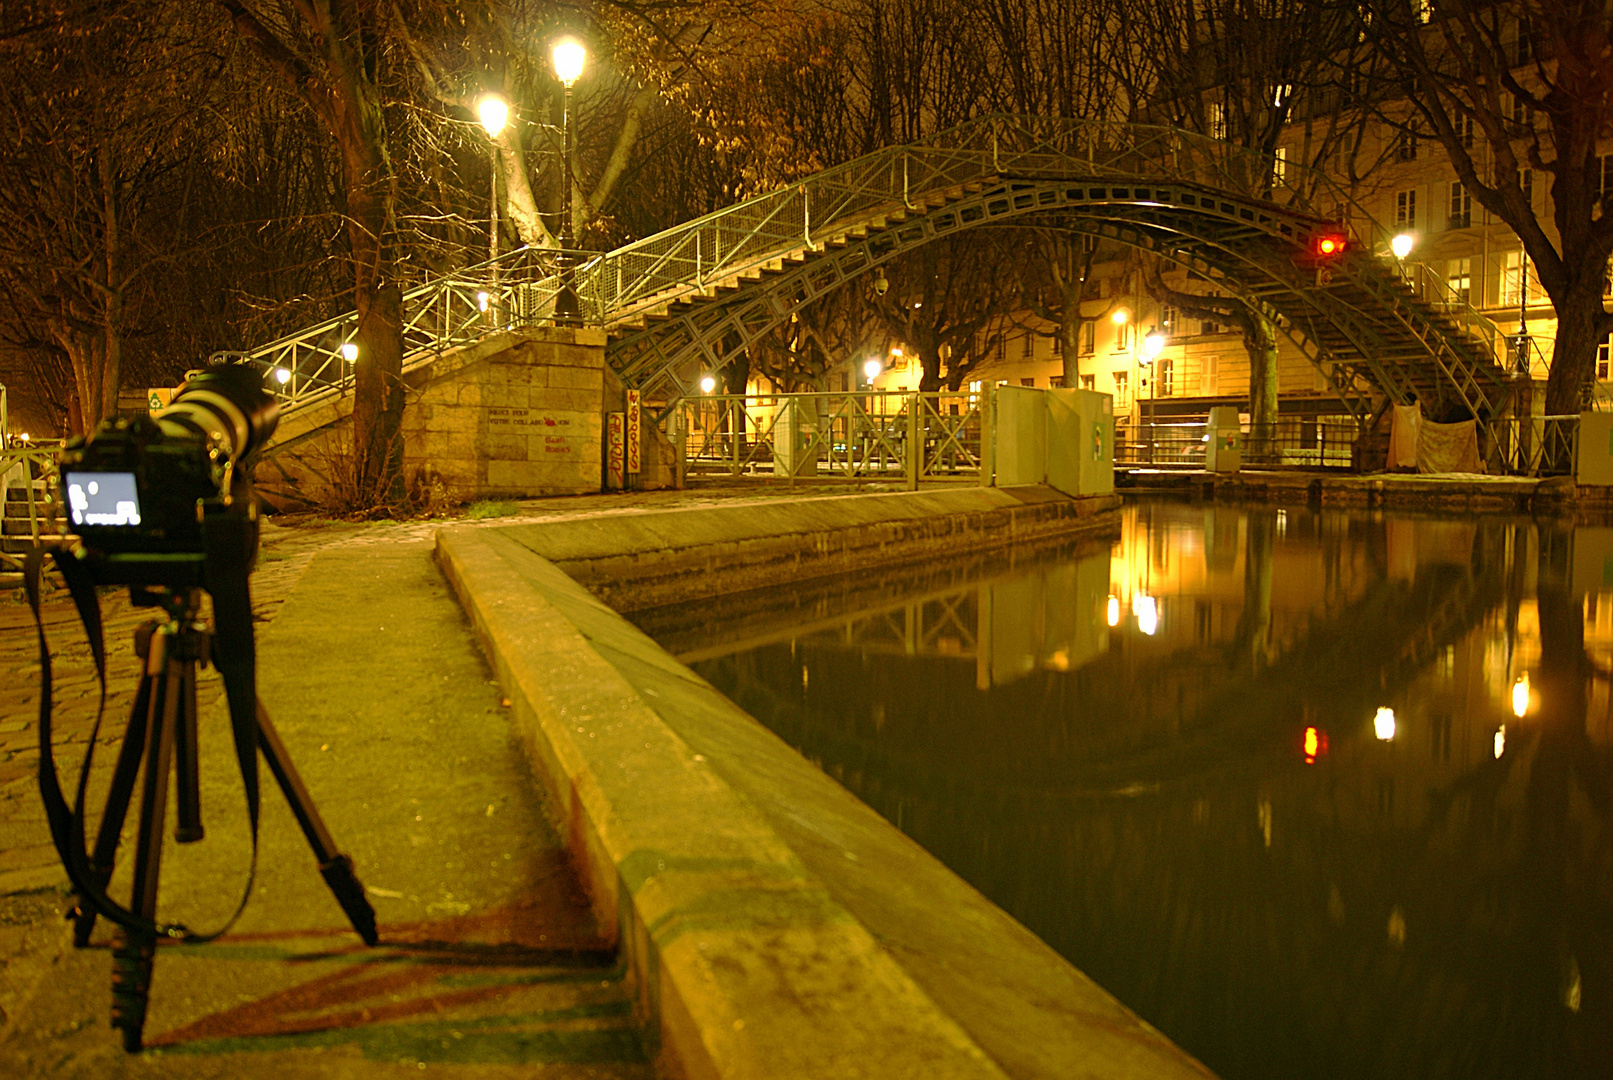 photographe au canal saint Martin, Paris